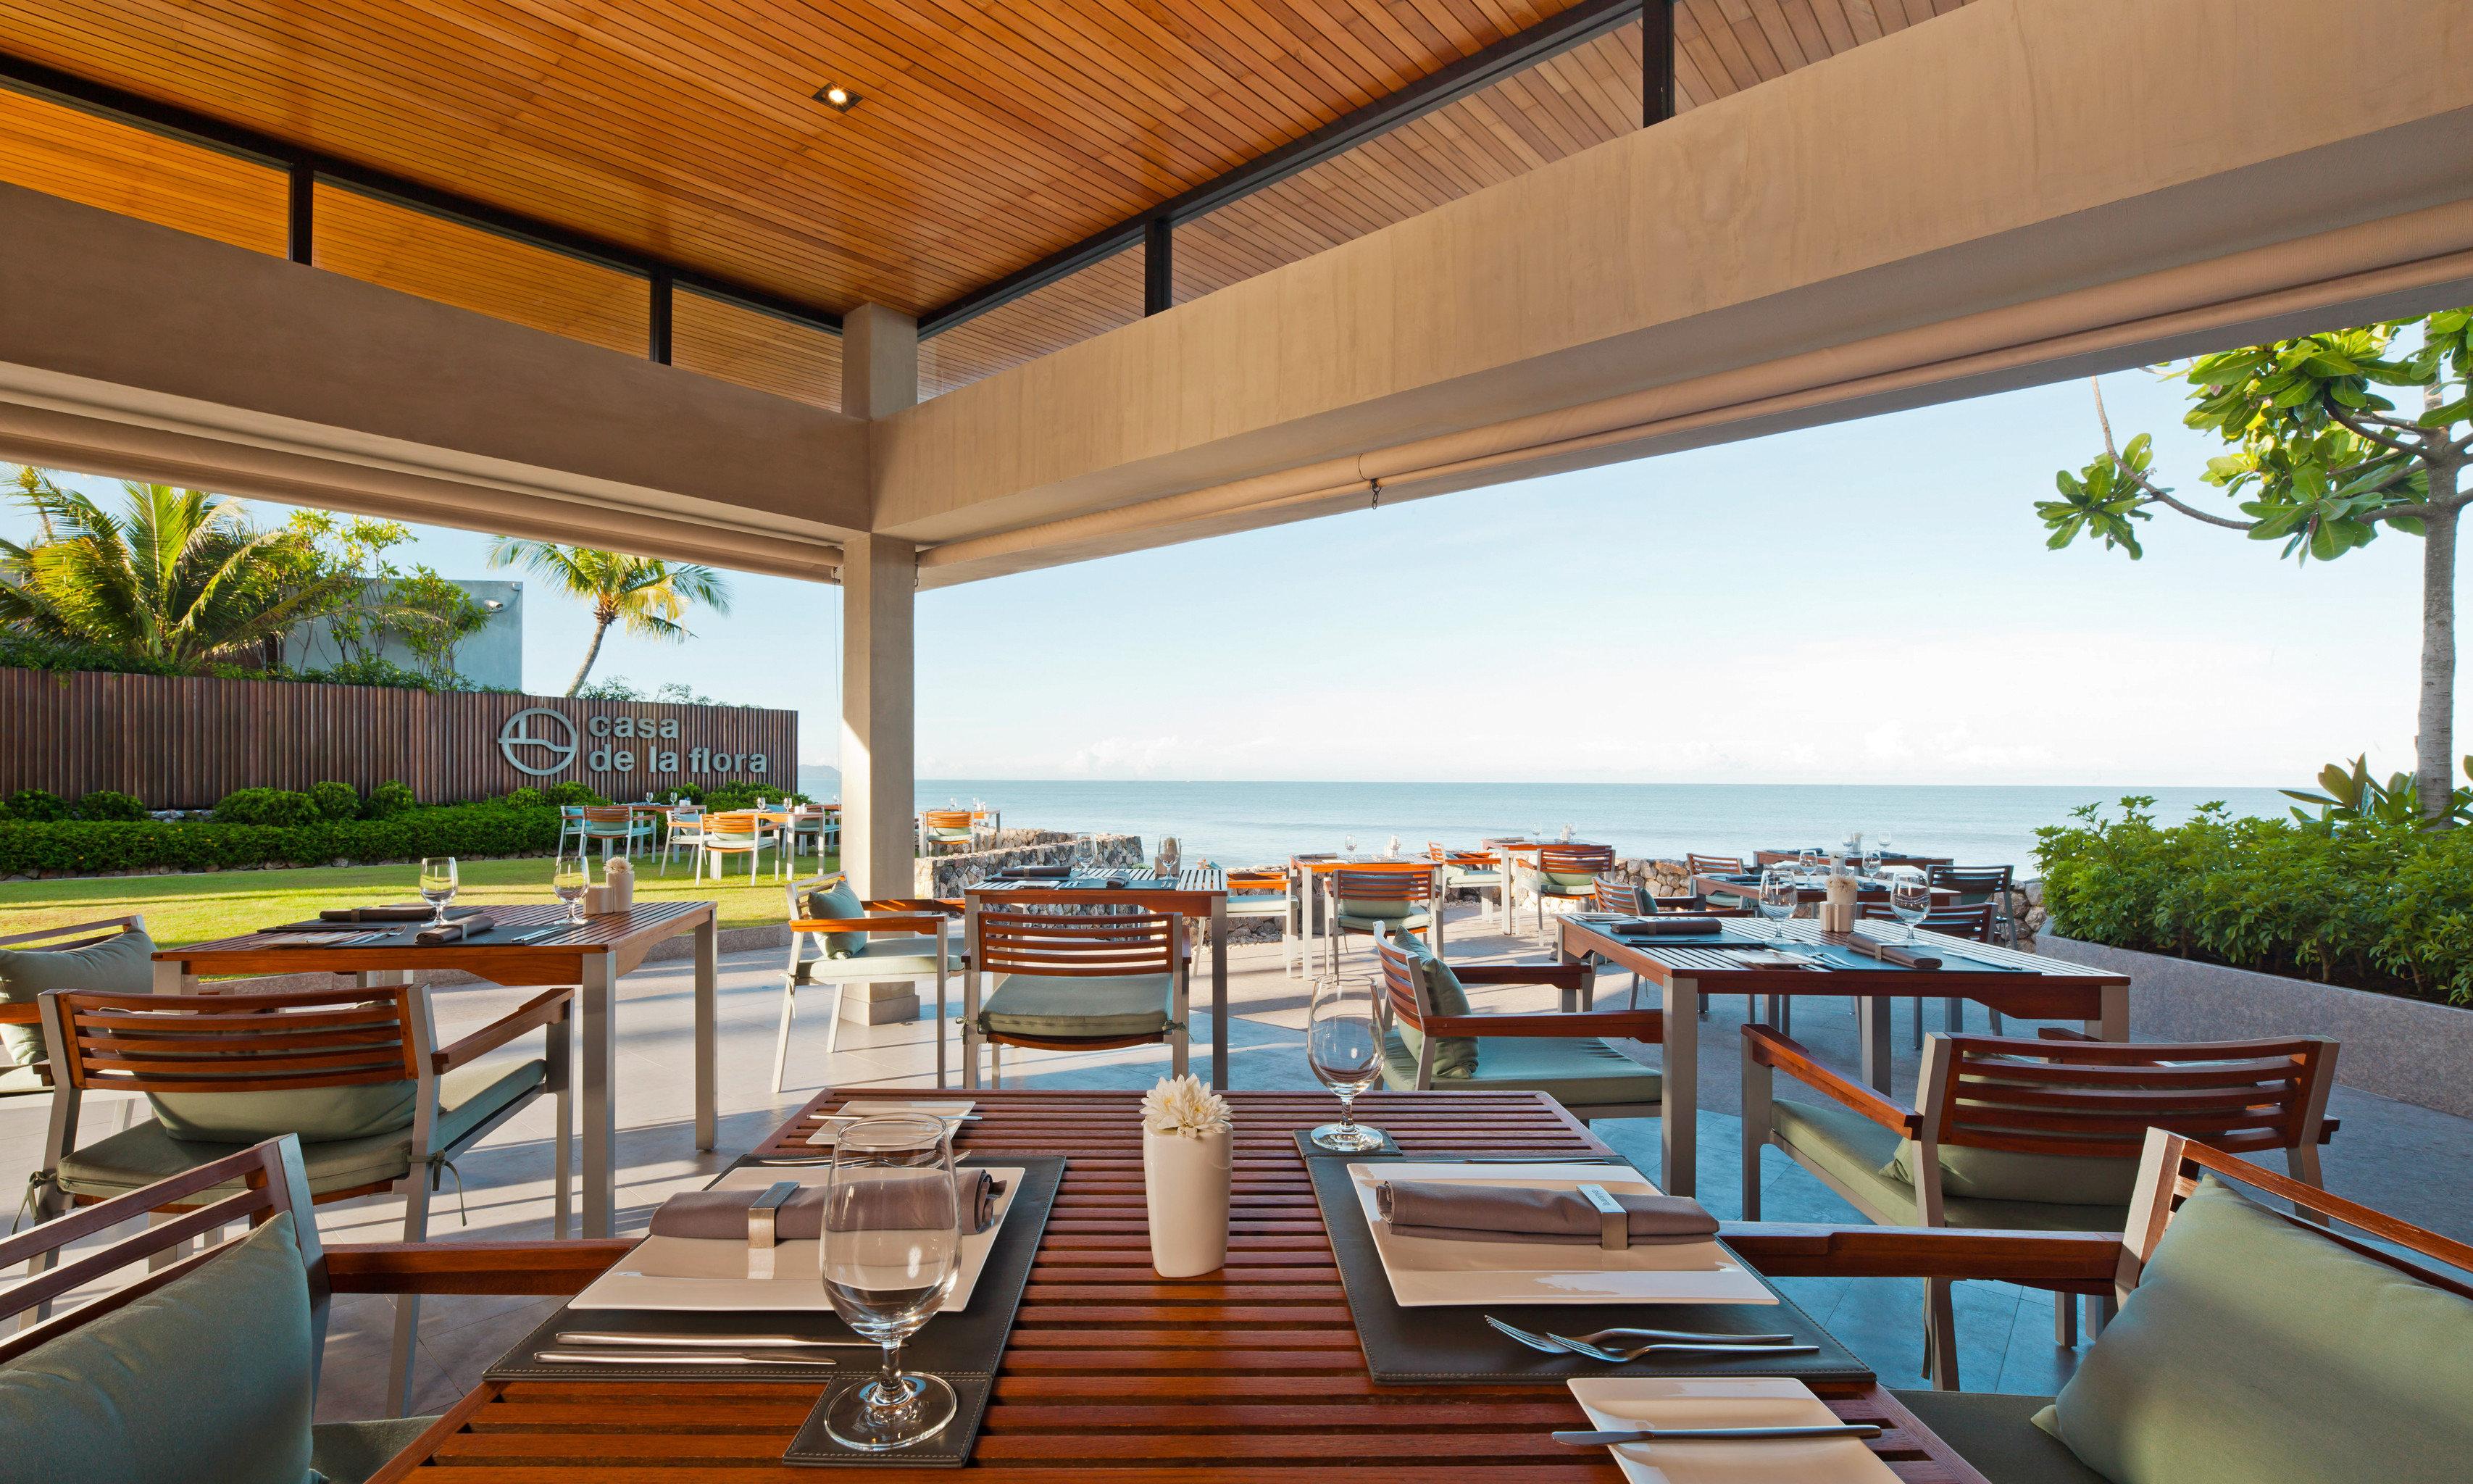 Beachfront Deck Dining Drink Eat Modern Romantic chair Resort property leisure wooden Villa condominium swimming pool home restaurant overlooking